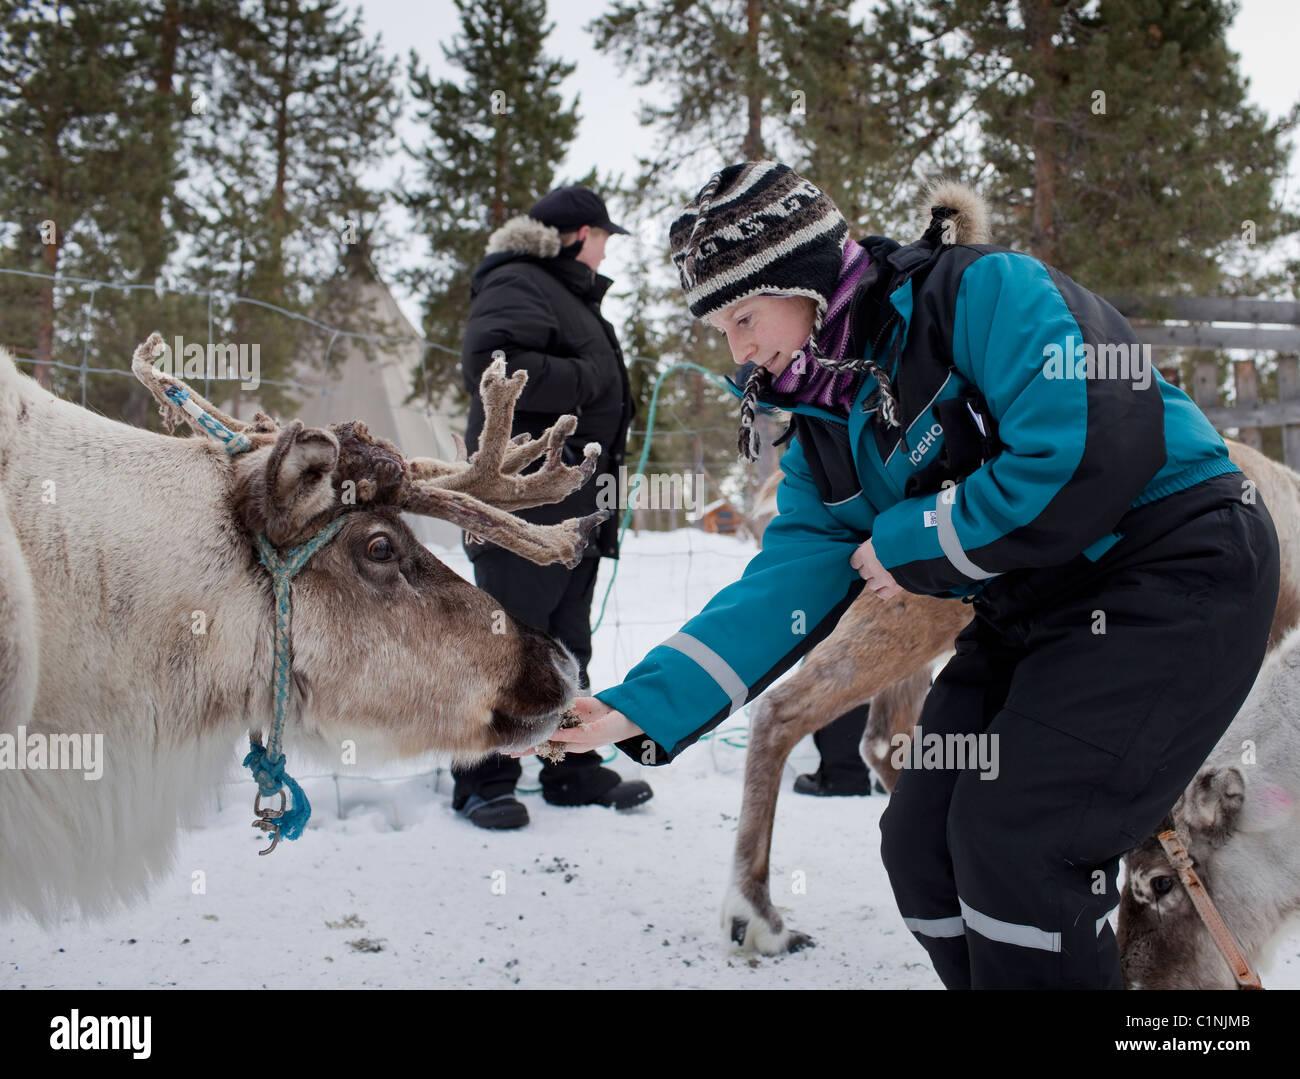 3ee9f9a6c24 Polar Animals Animal Adventure Arctic Traditional Clothing Deer ...